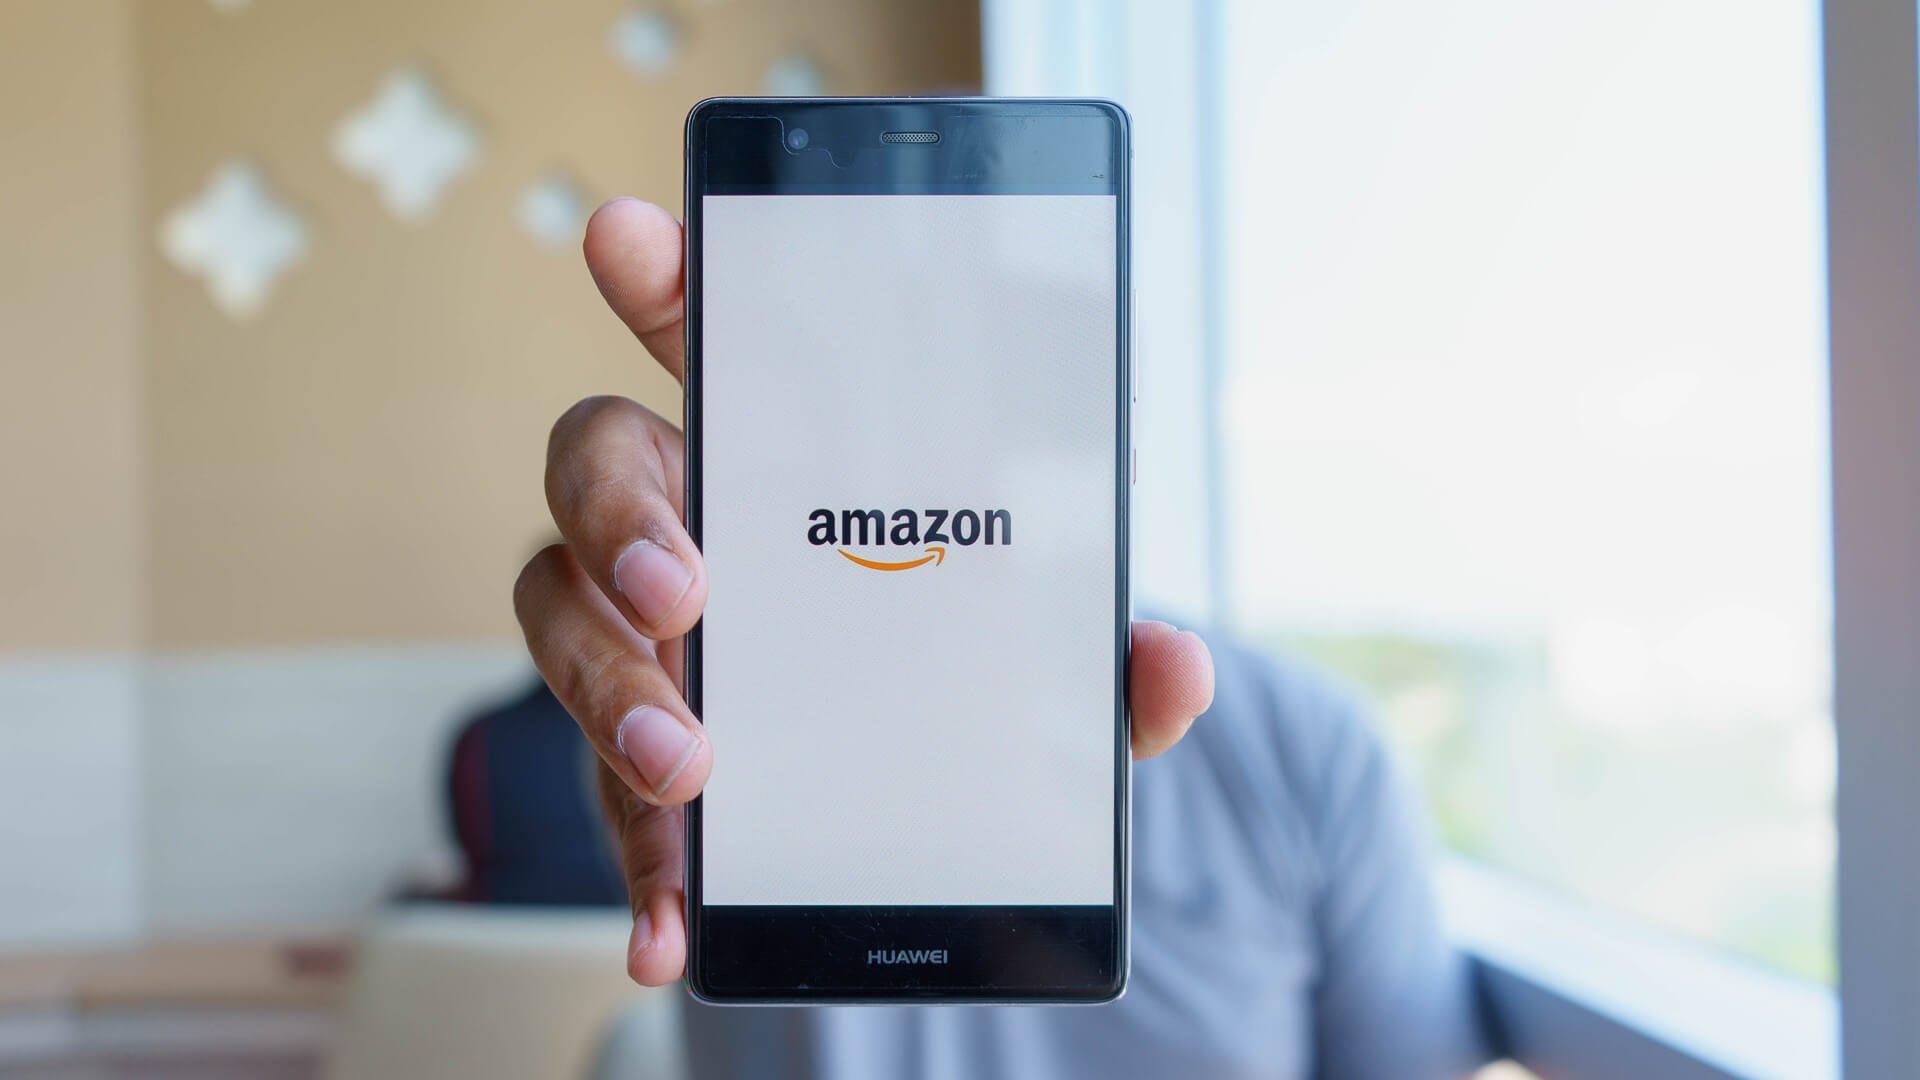 23 Secret Ways To Save Money on Amazon